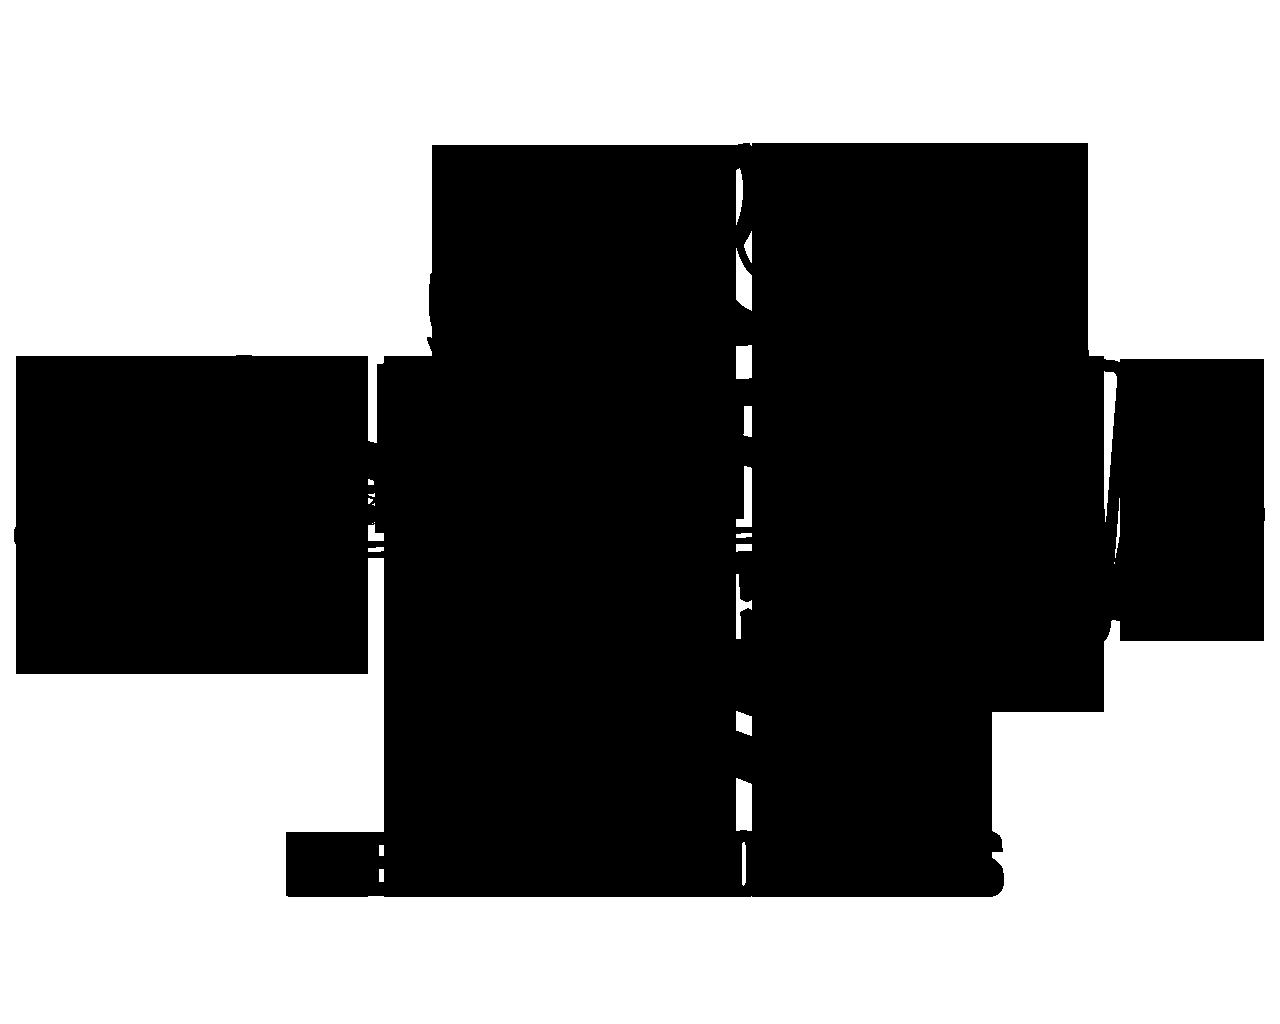 gimnasio